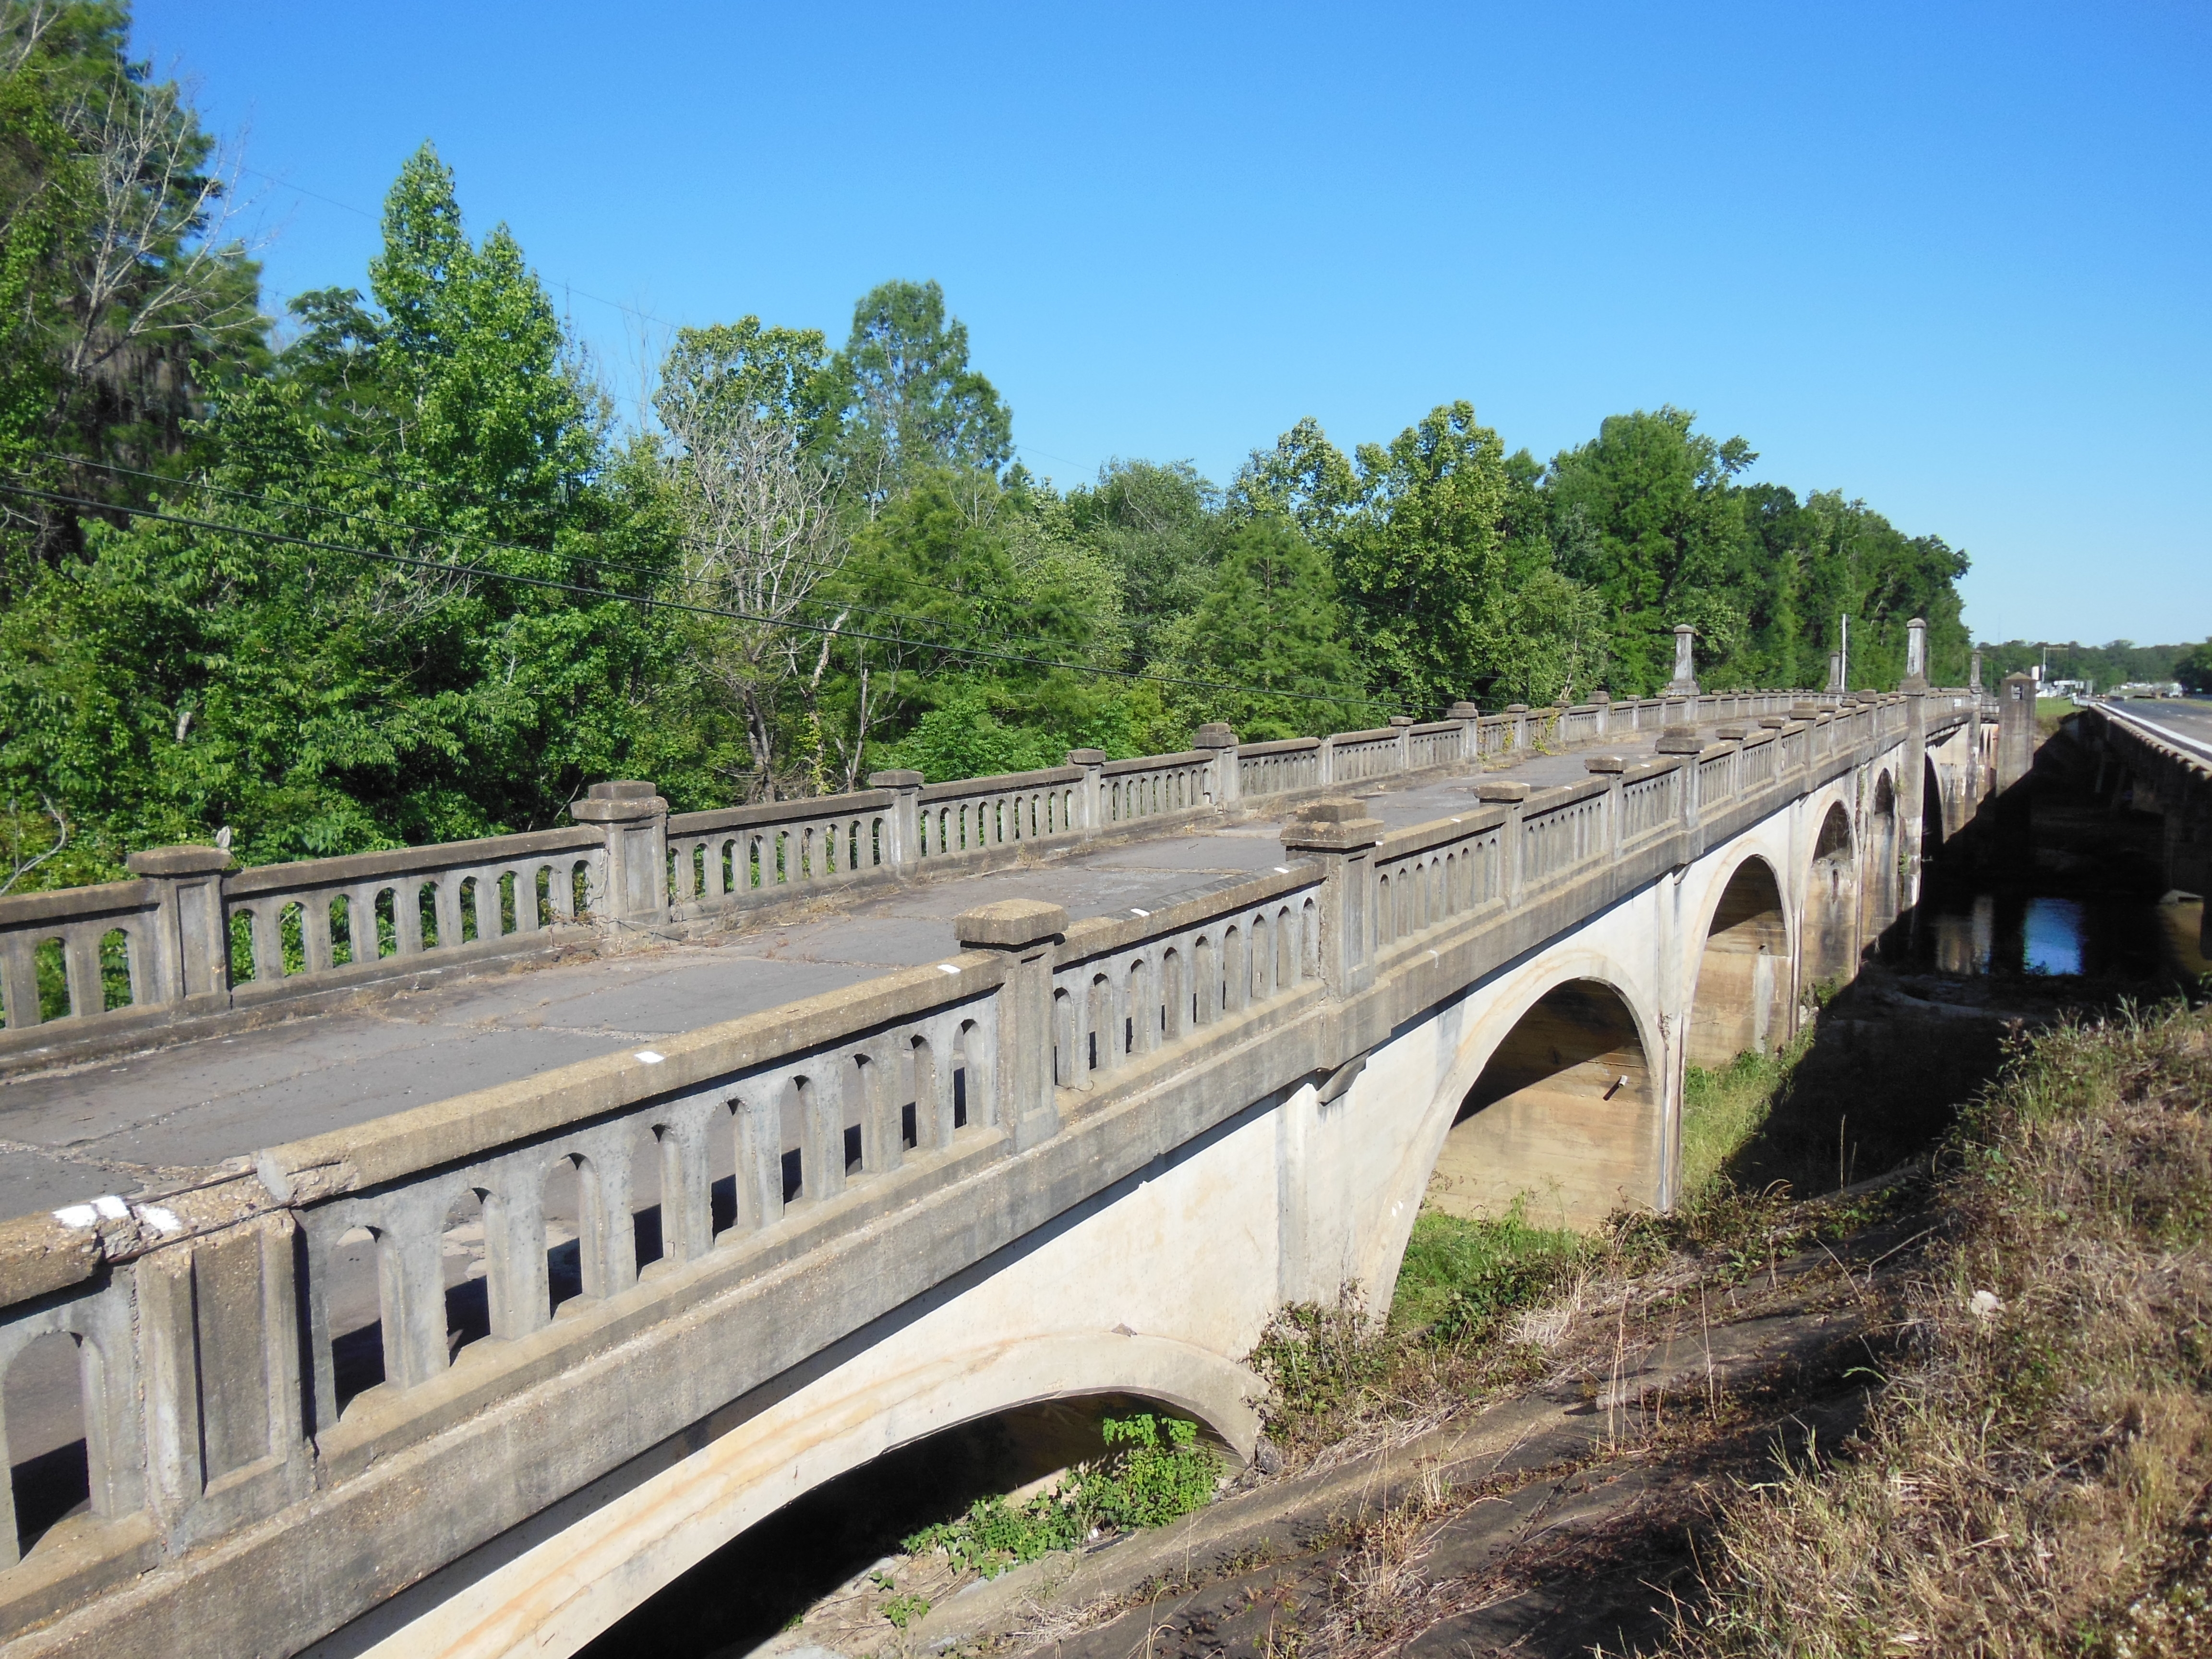 Veterans' Memorial Bridge 100 years old today, August 3, 1910.